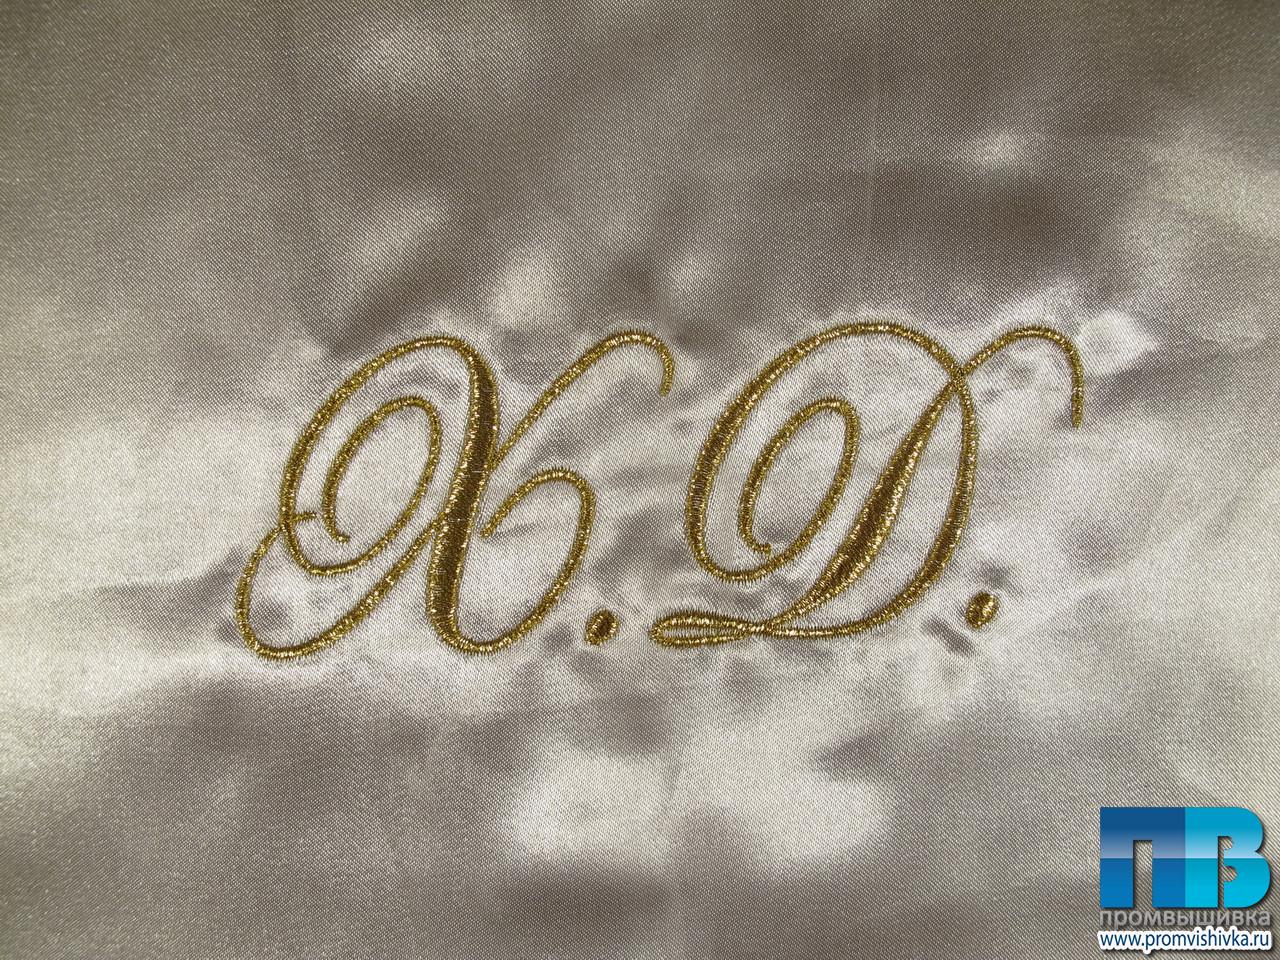 Вышивка инициалов на белье